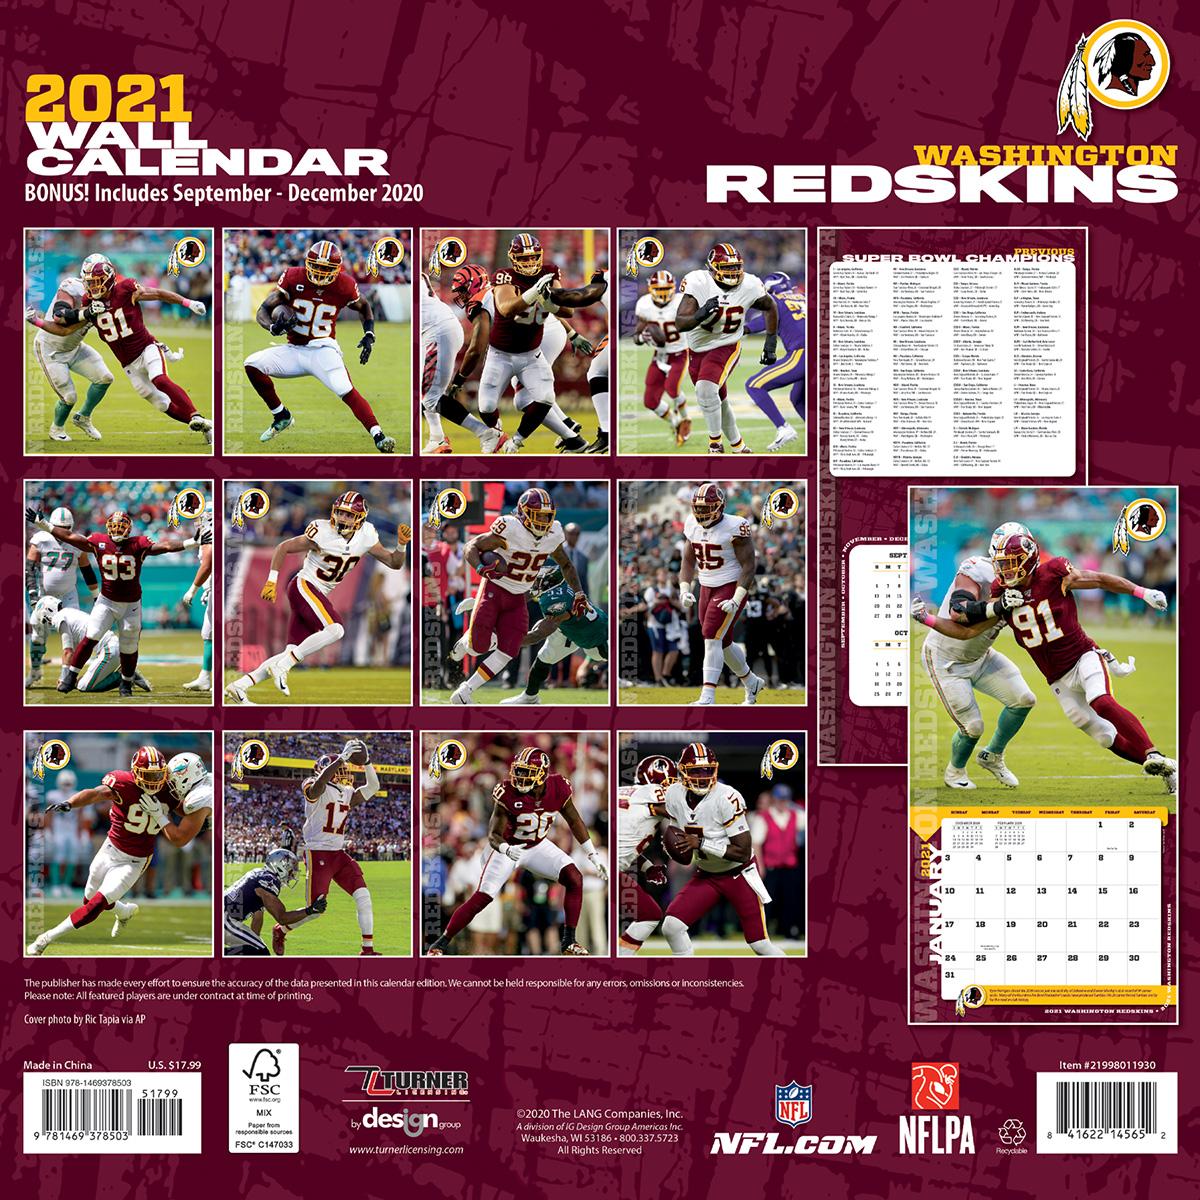 Washington Redskins 2018 Nfl Wall Calendar Buy At Khc Sports